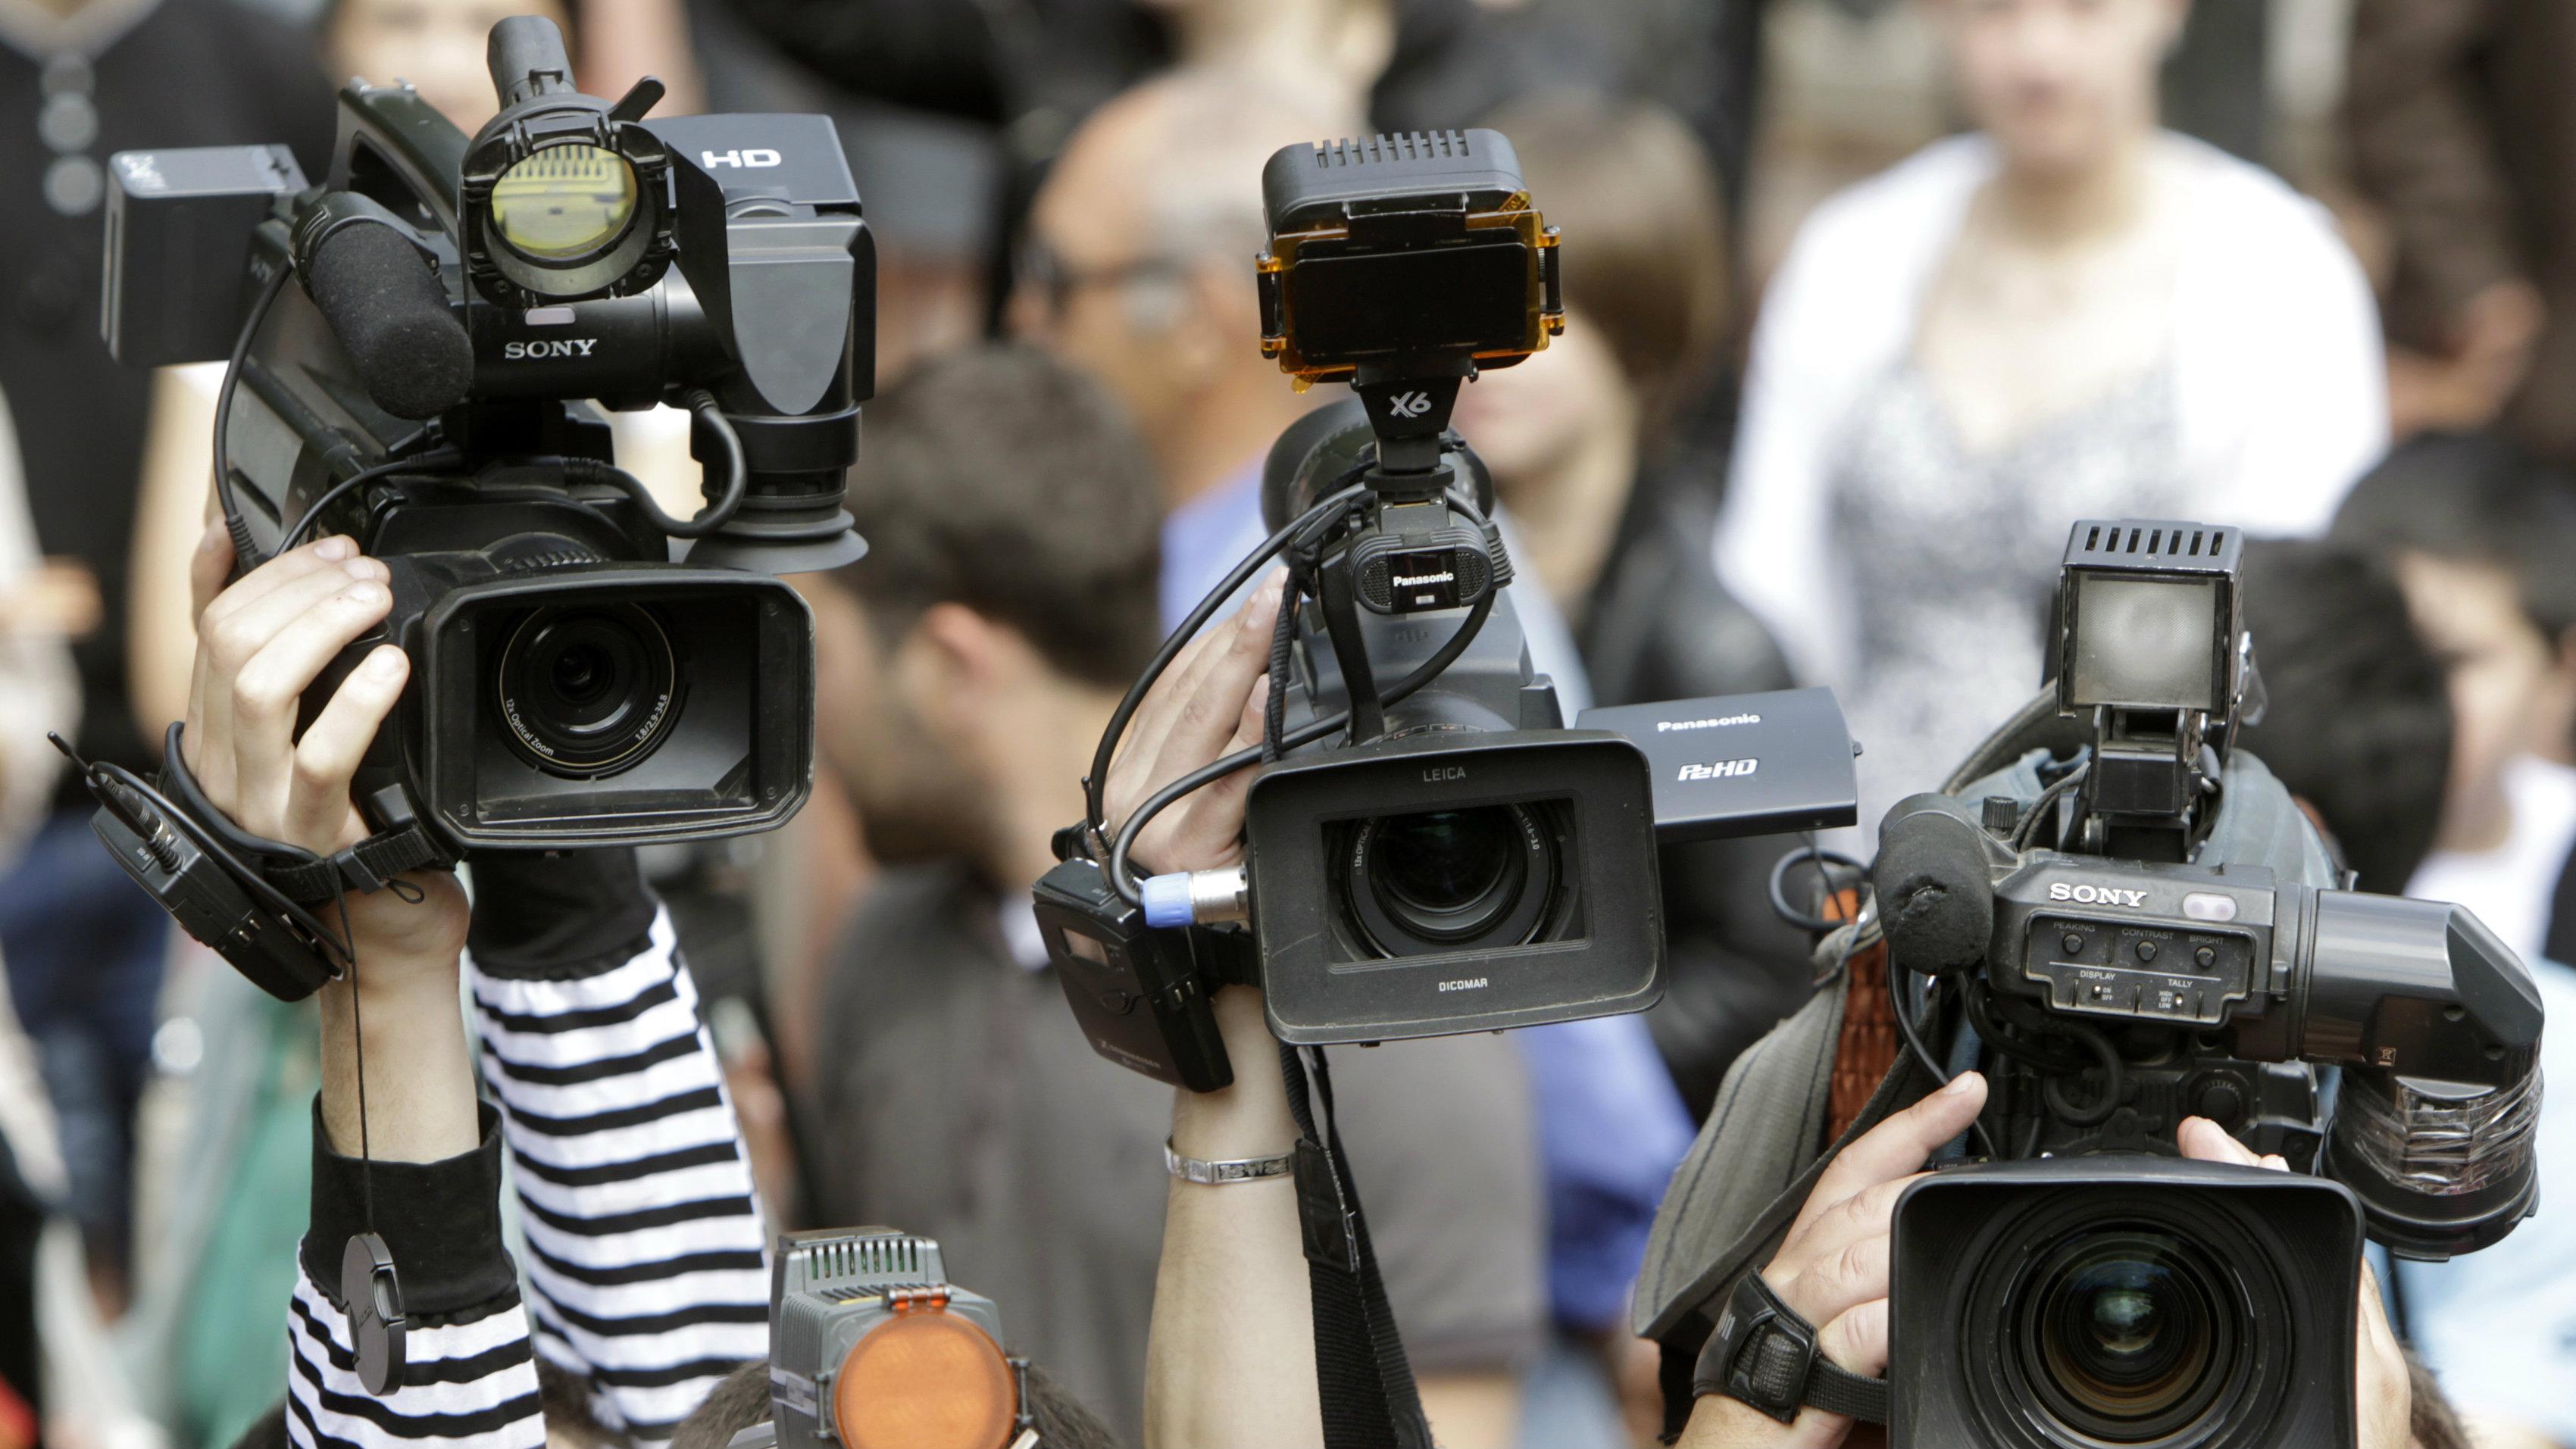 Cameramen lift their cameras to film in Tbilisi May 9, 2012. REUTERS/David Mdzinarishvili (GEORGIA - Tags: MEDIA)